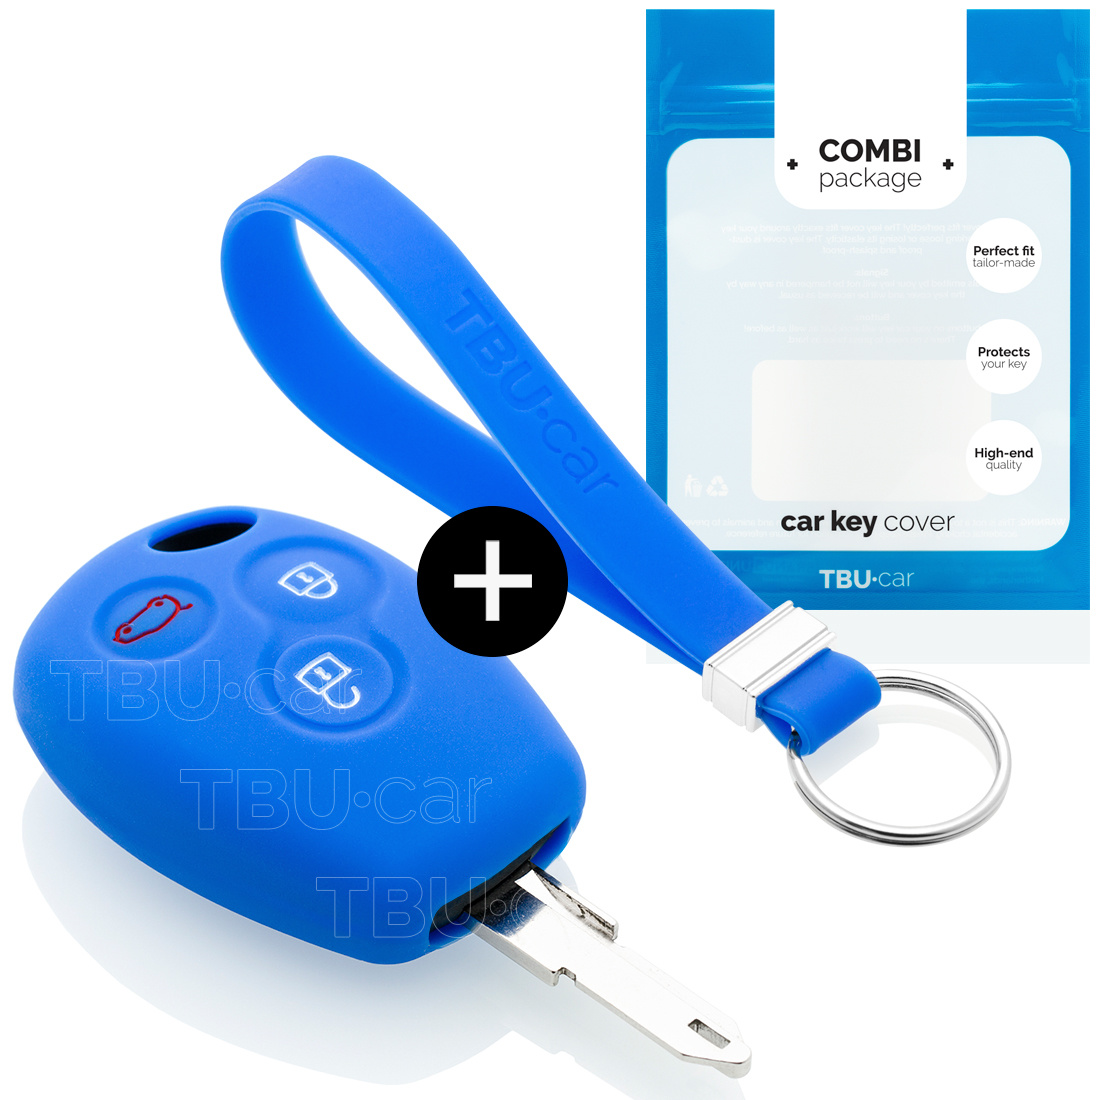 TBU car TBU car Autoschlüssel Hülle kompatibel mit Dacia 3 Tasten - Schutzhülle aus Silikon - Auto Schlüsselhülle Cover in Blau